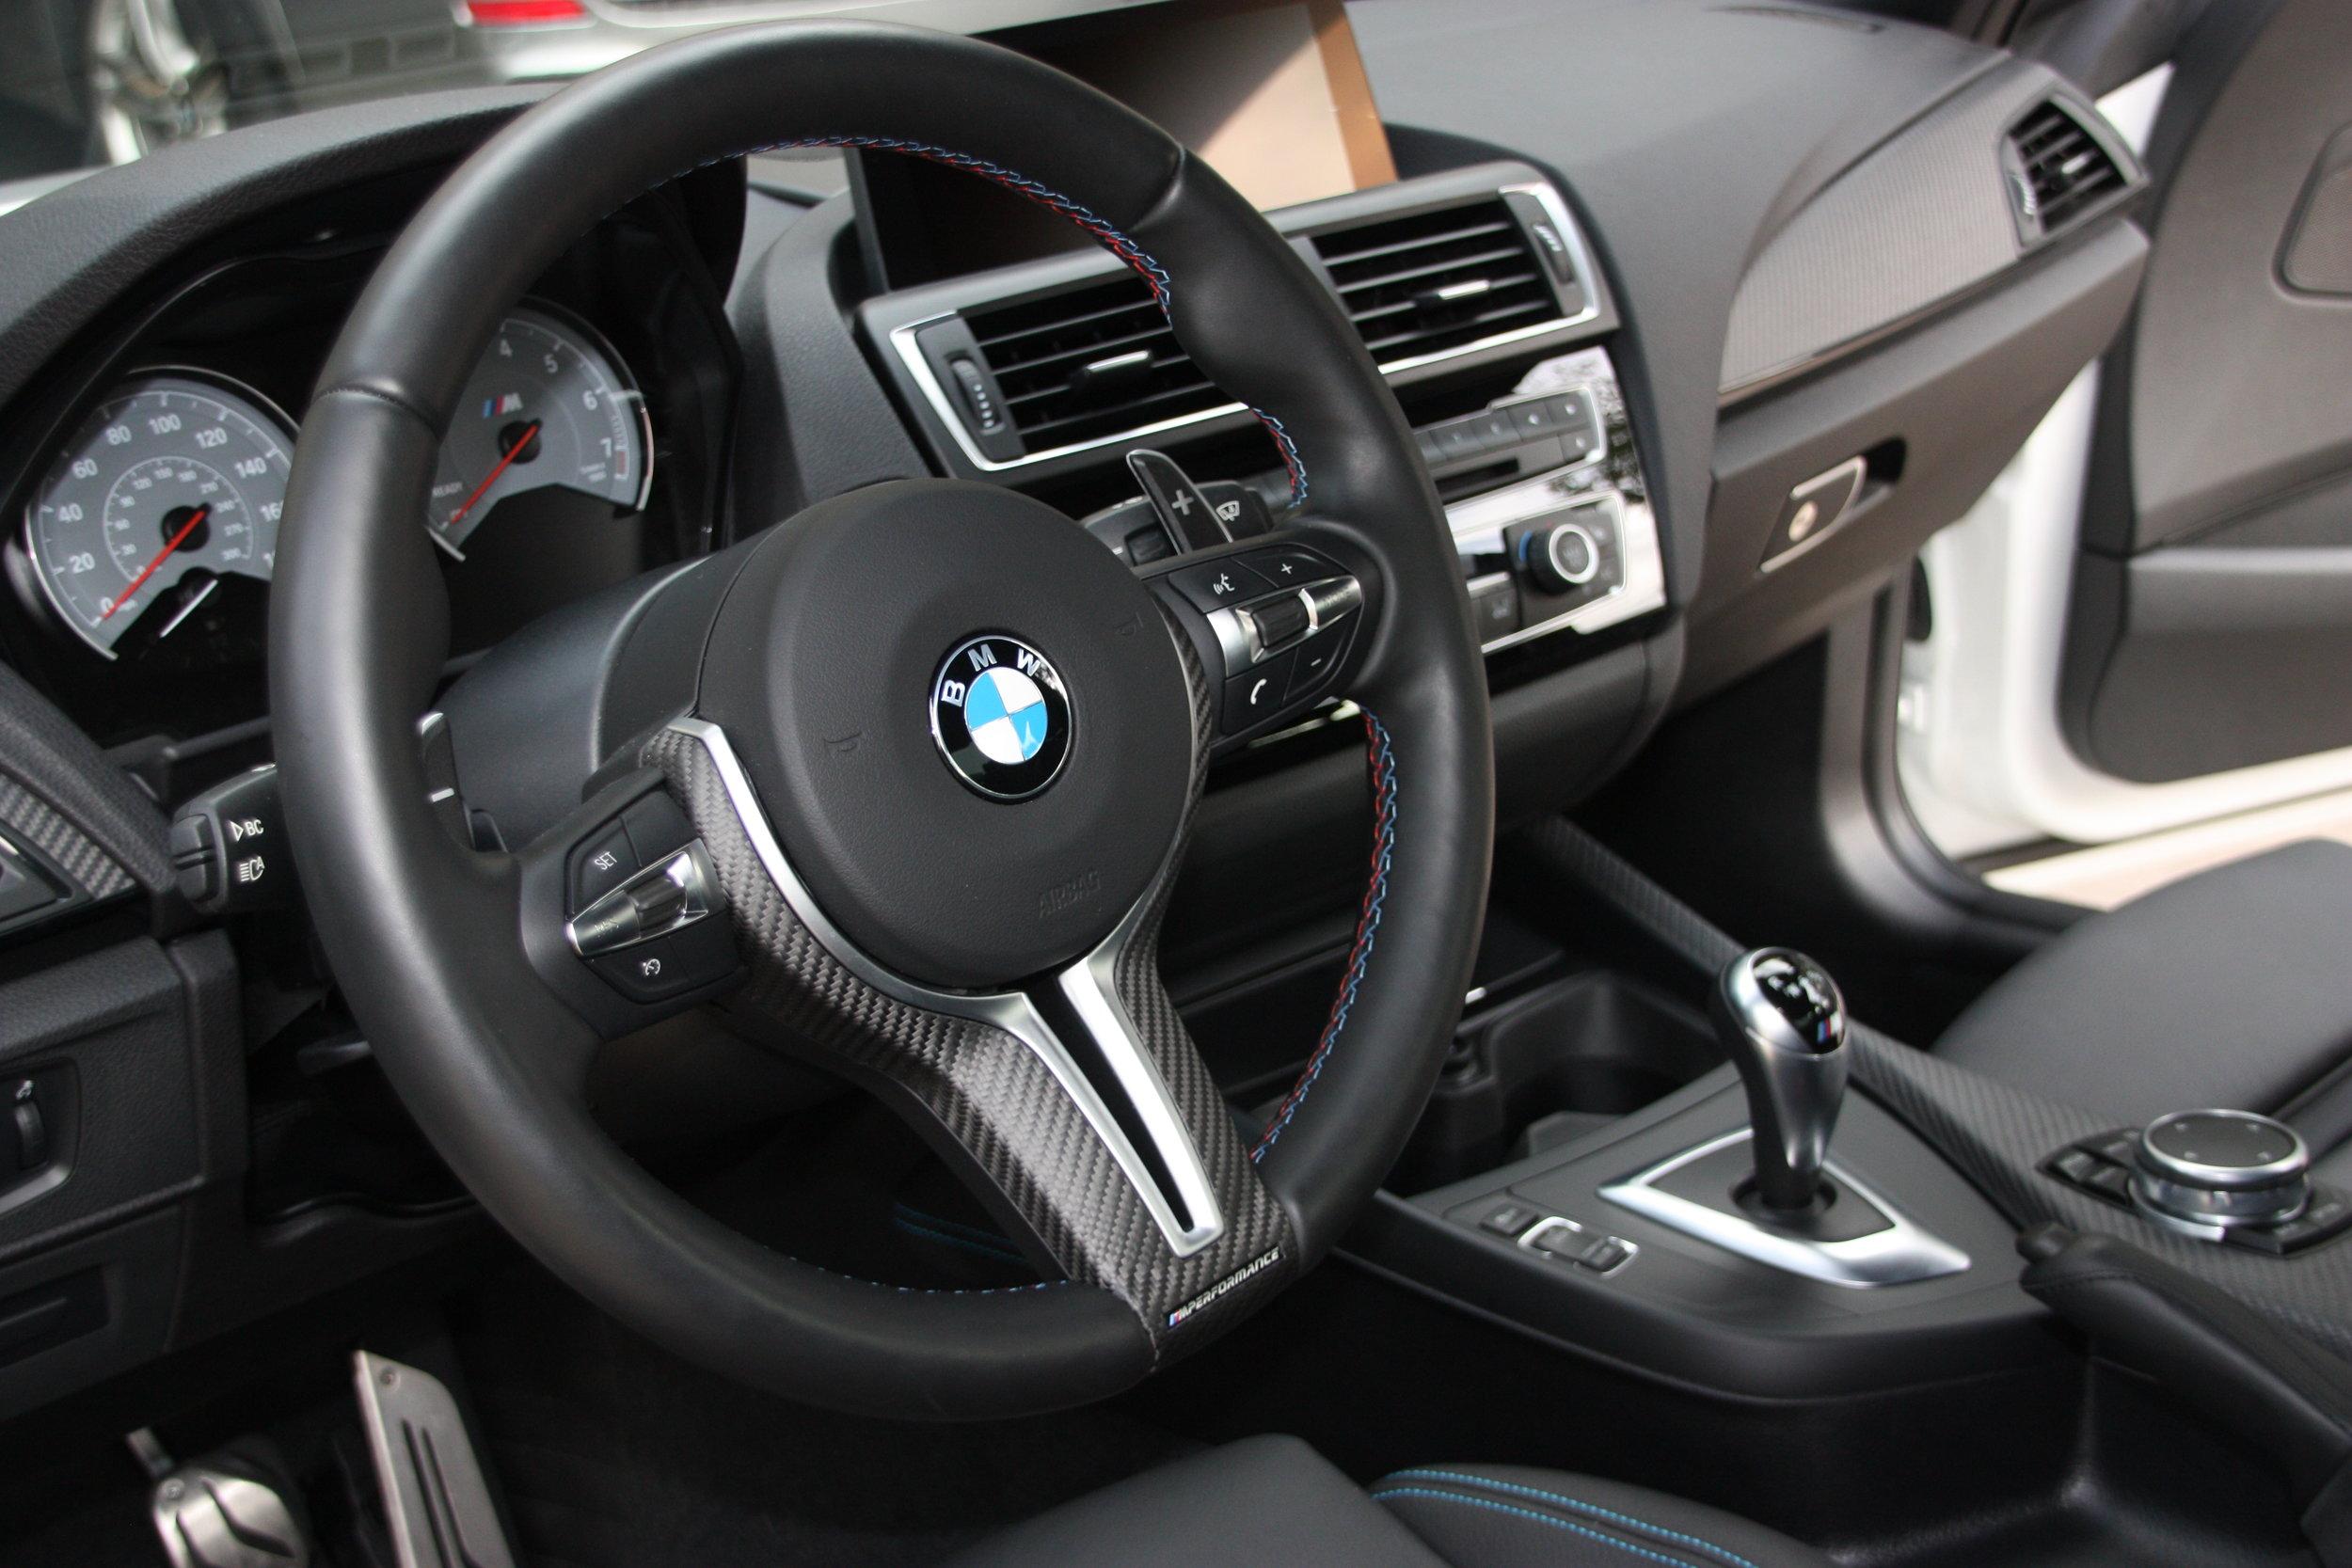 carbon fiber (matte) trim